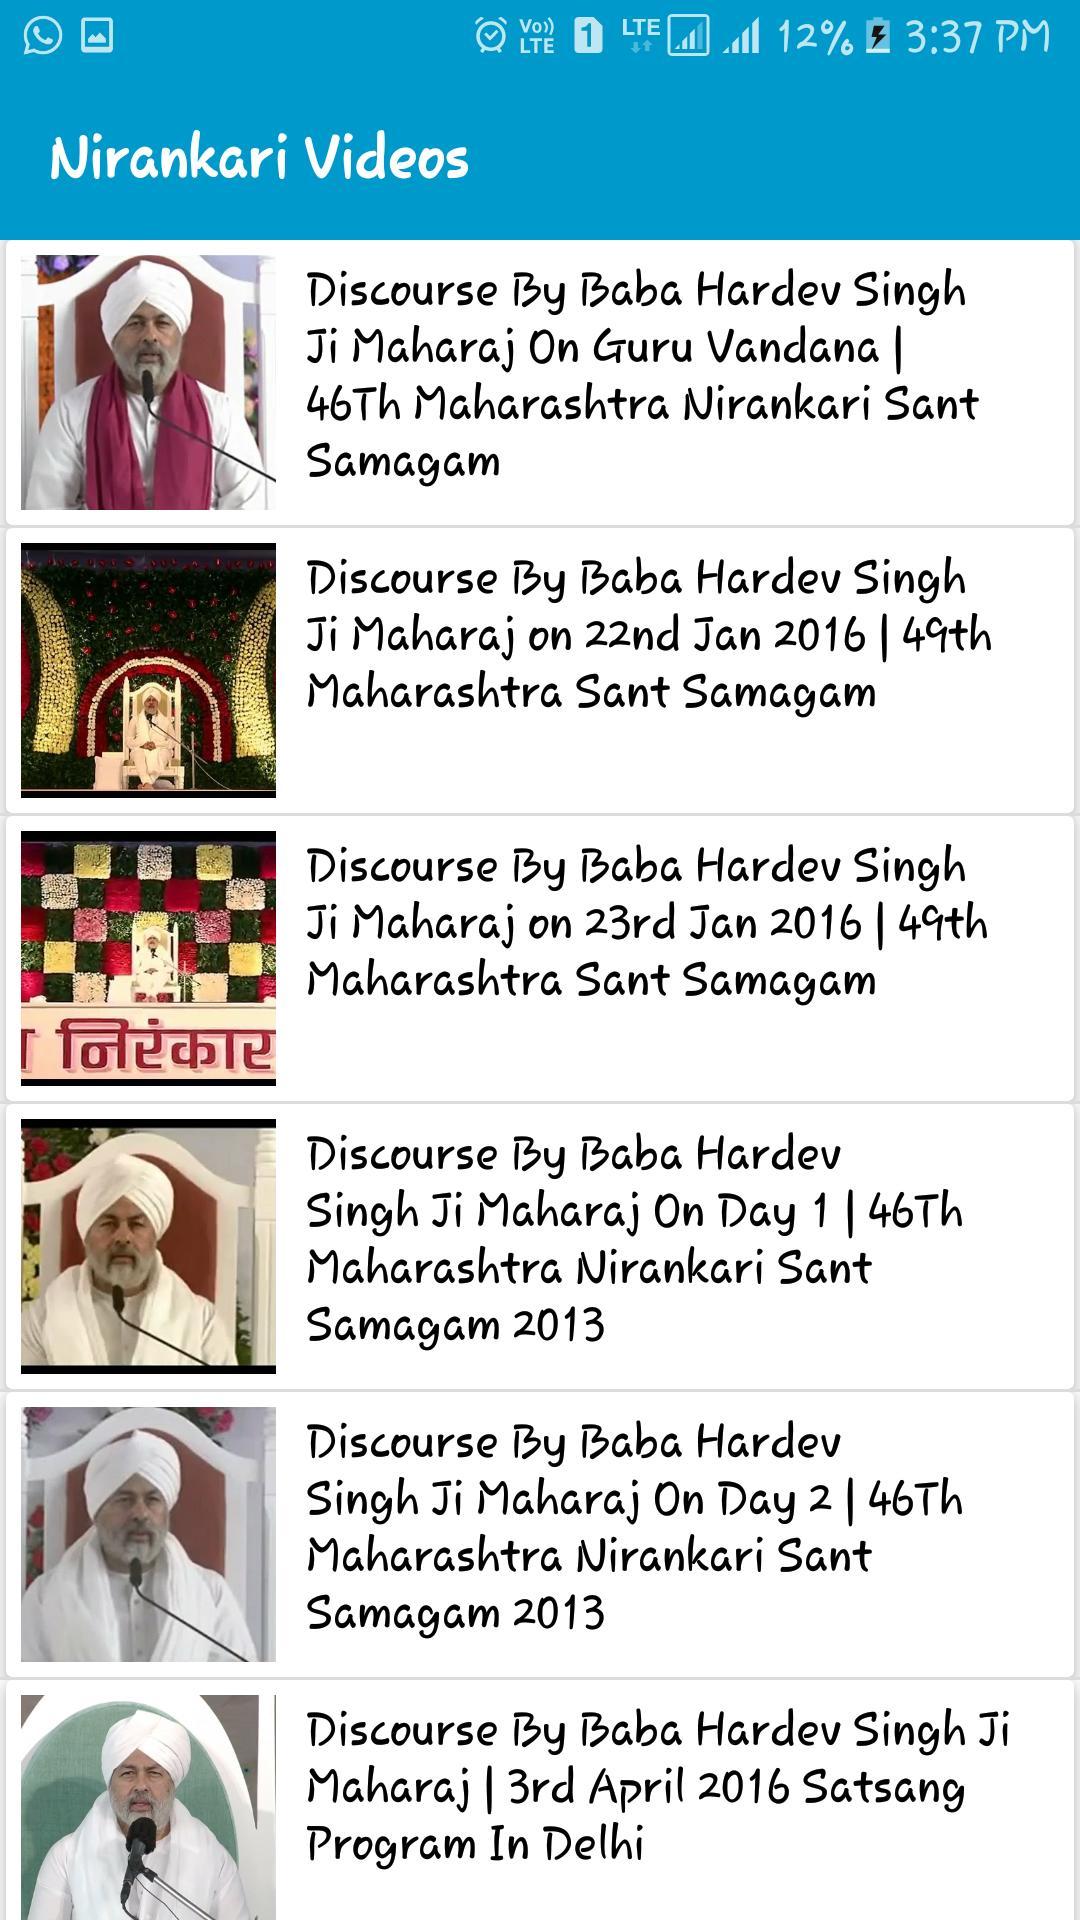 Nirankari Videos for Android - APK Download